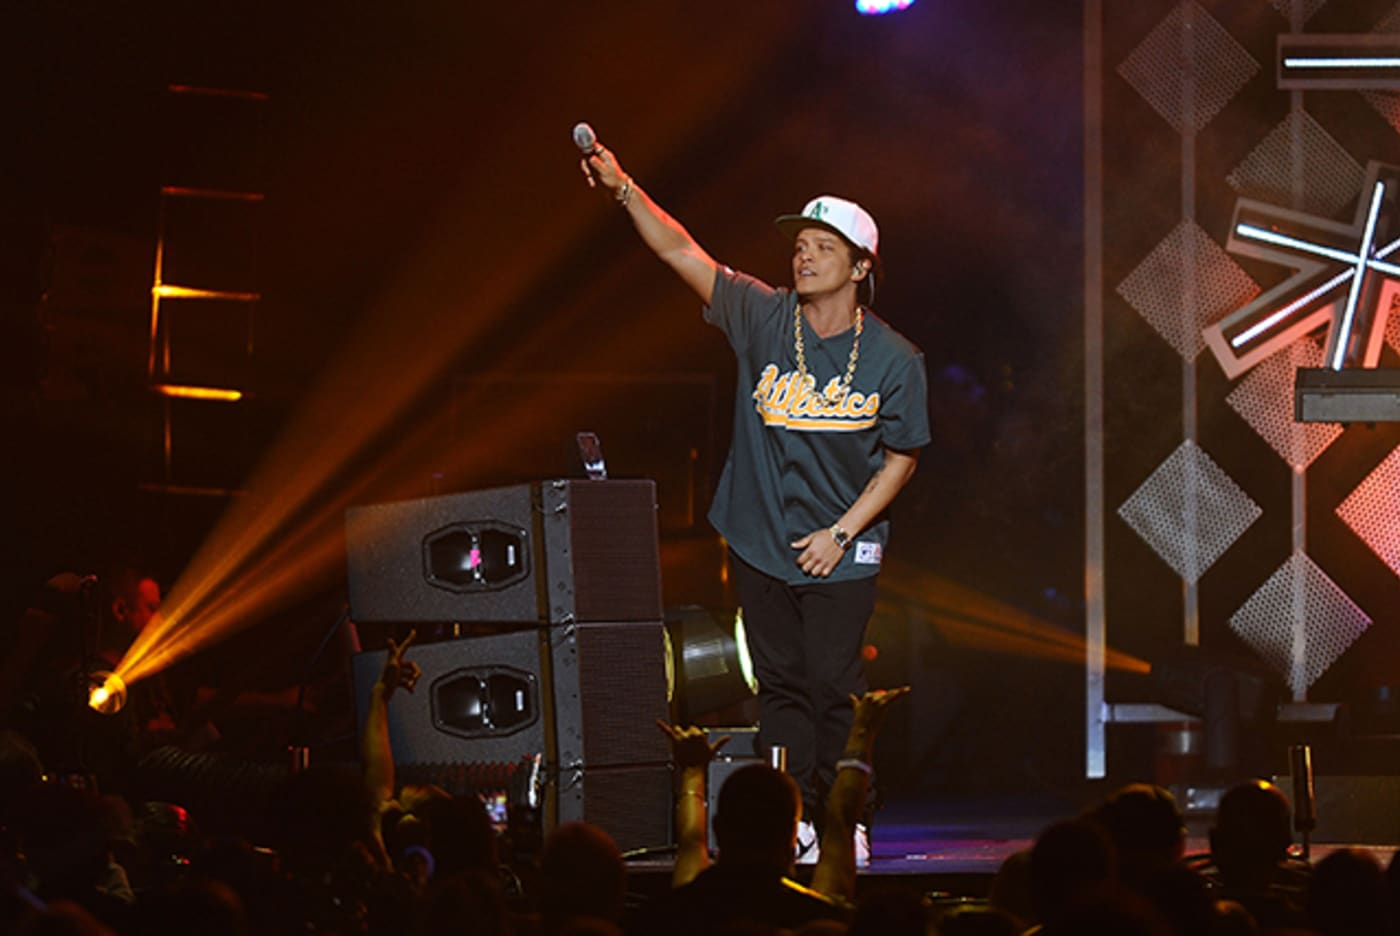 Bruno Mars at 102.7 KIIS FM's Jingle Ball 2016